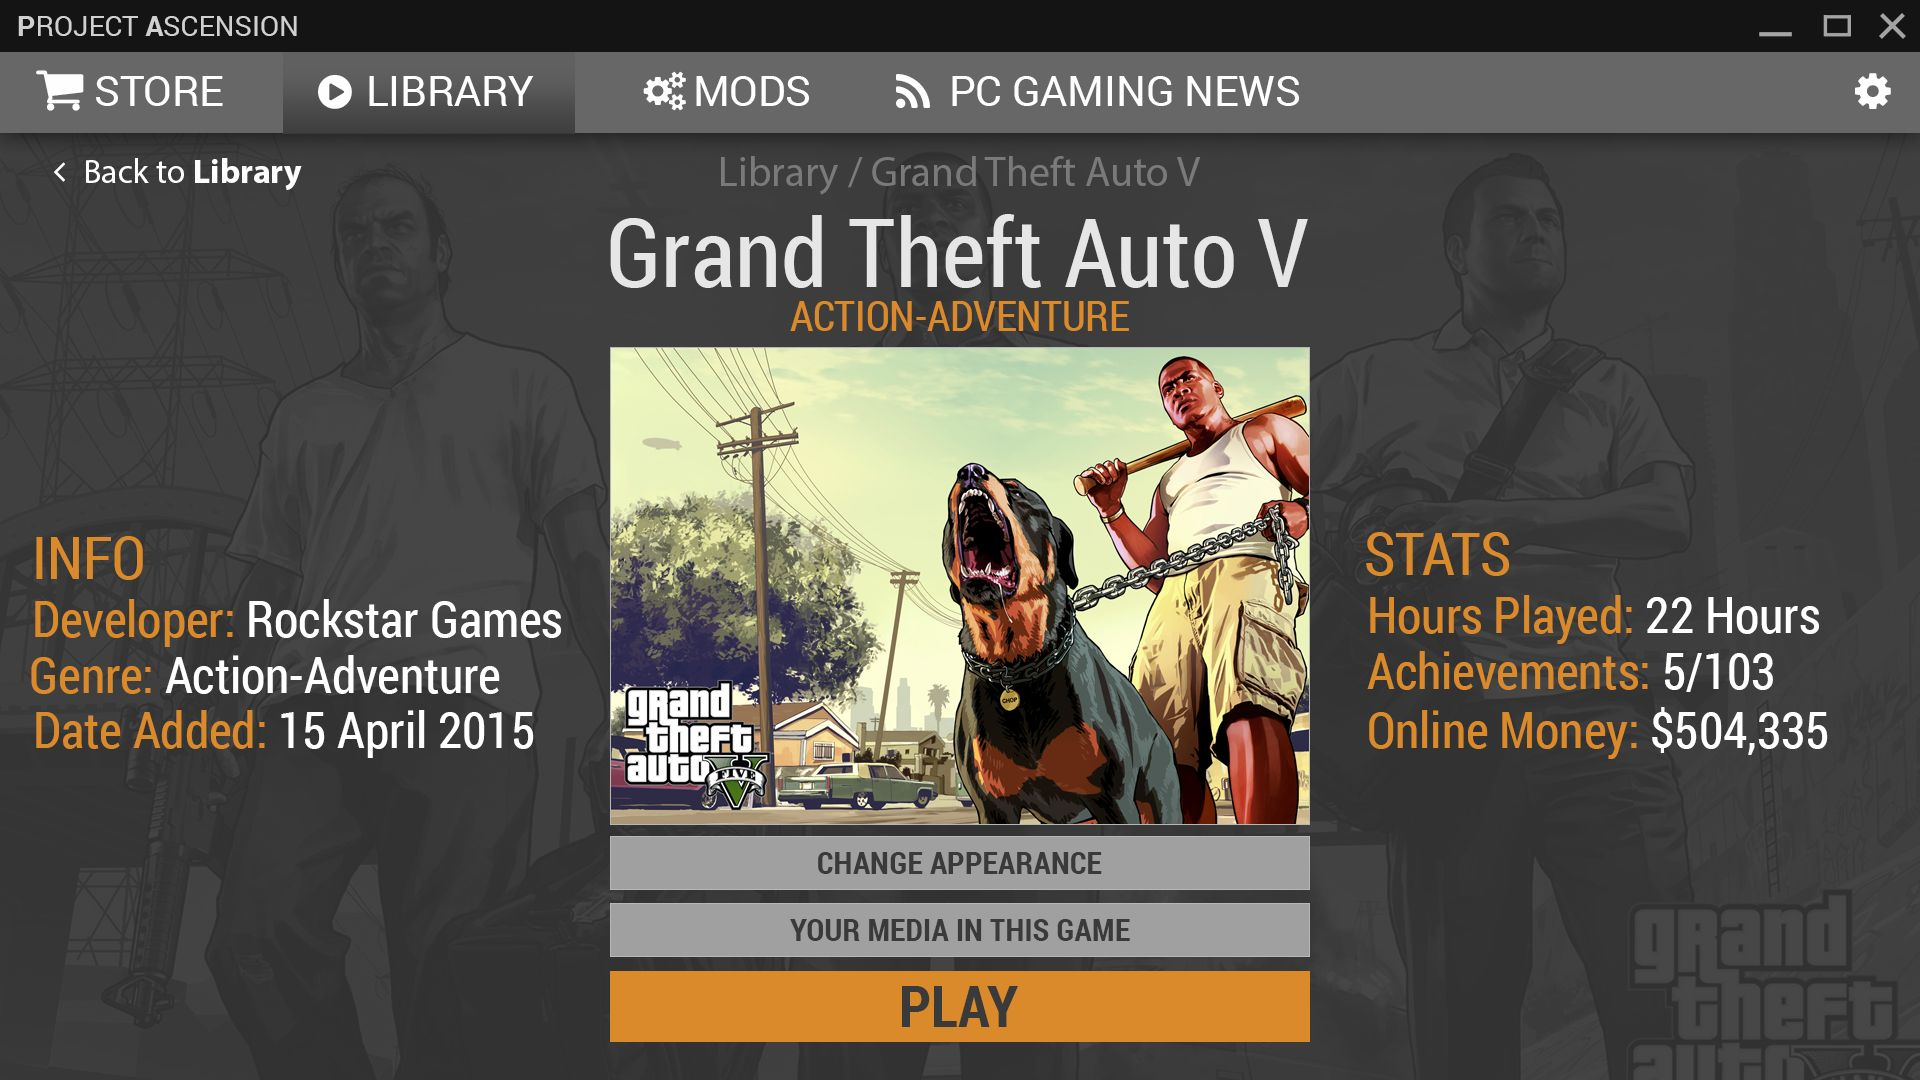 Valve's Mods Blunder Prompts Reddit Community to Create Open Source